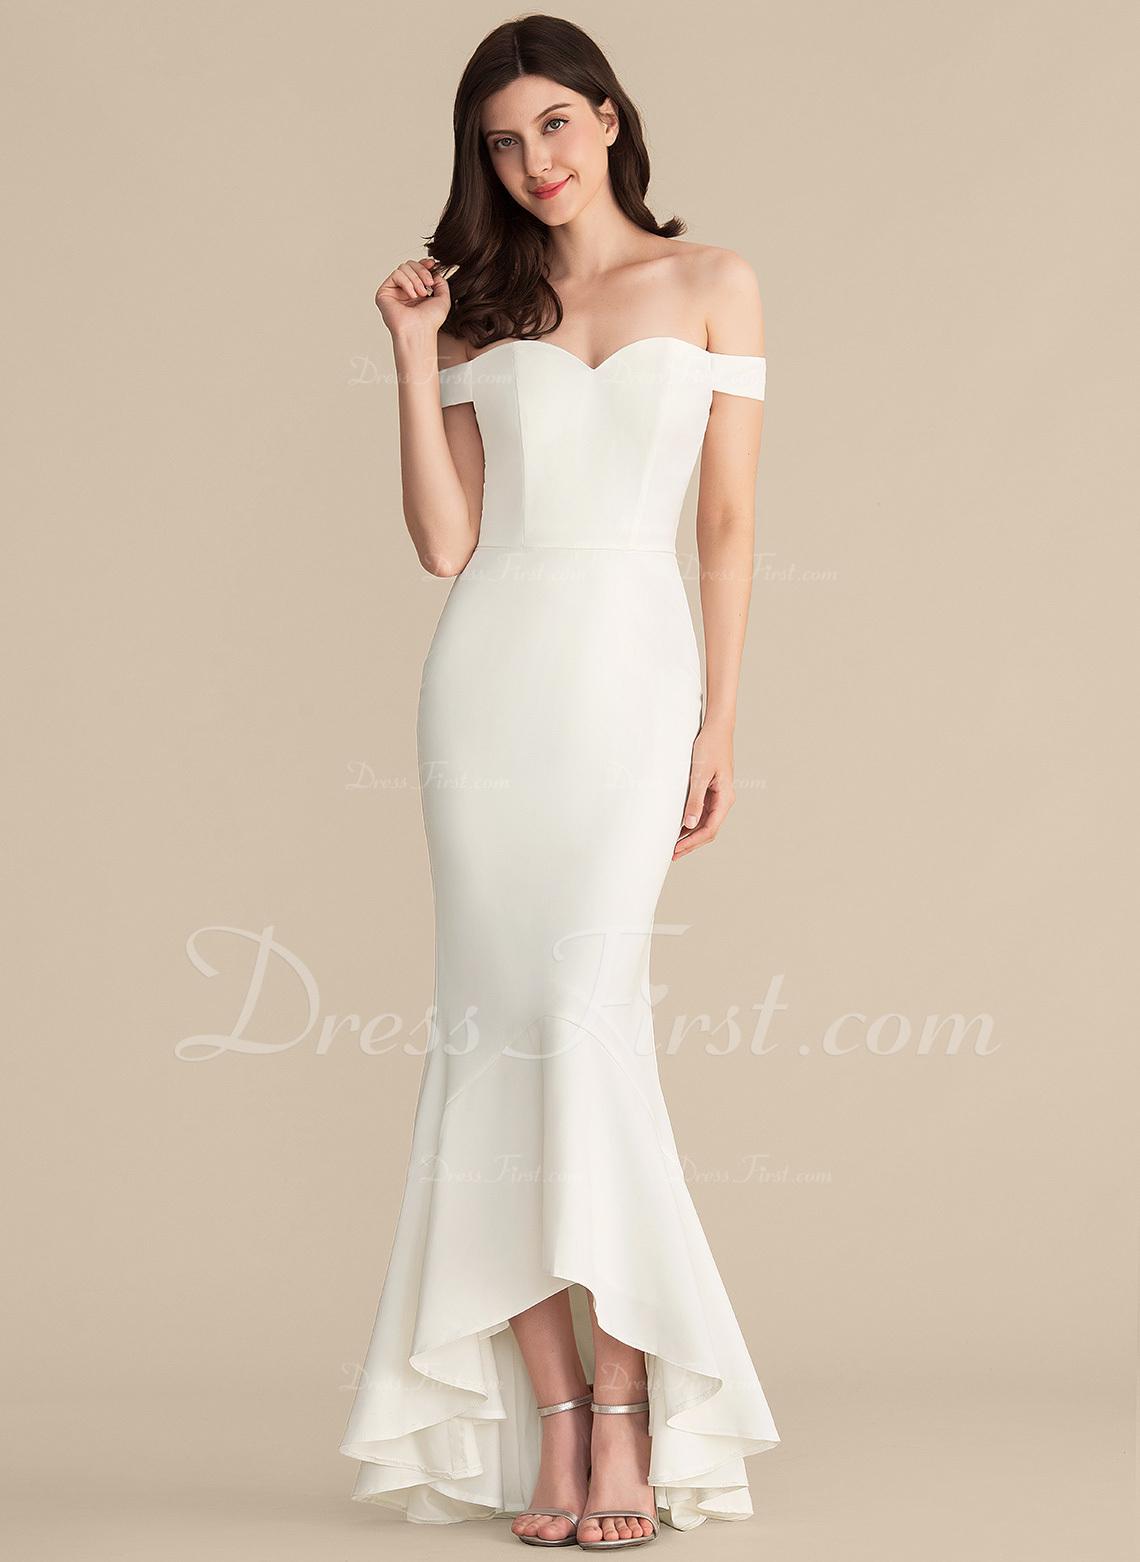 Trumpet/Mermaid Off-the-Shoulder Asymmetrical Stretch Crepe Wedding Dress